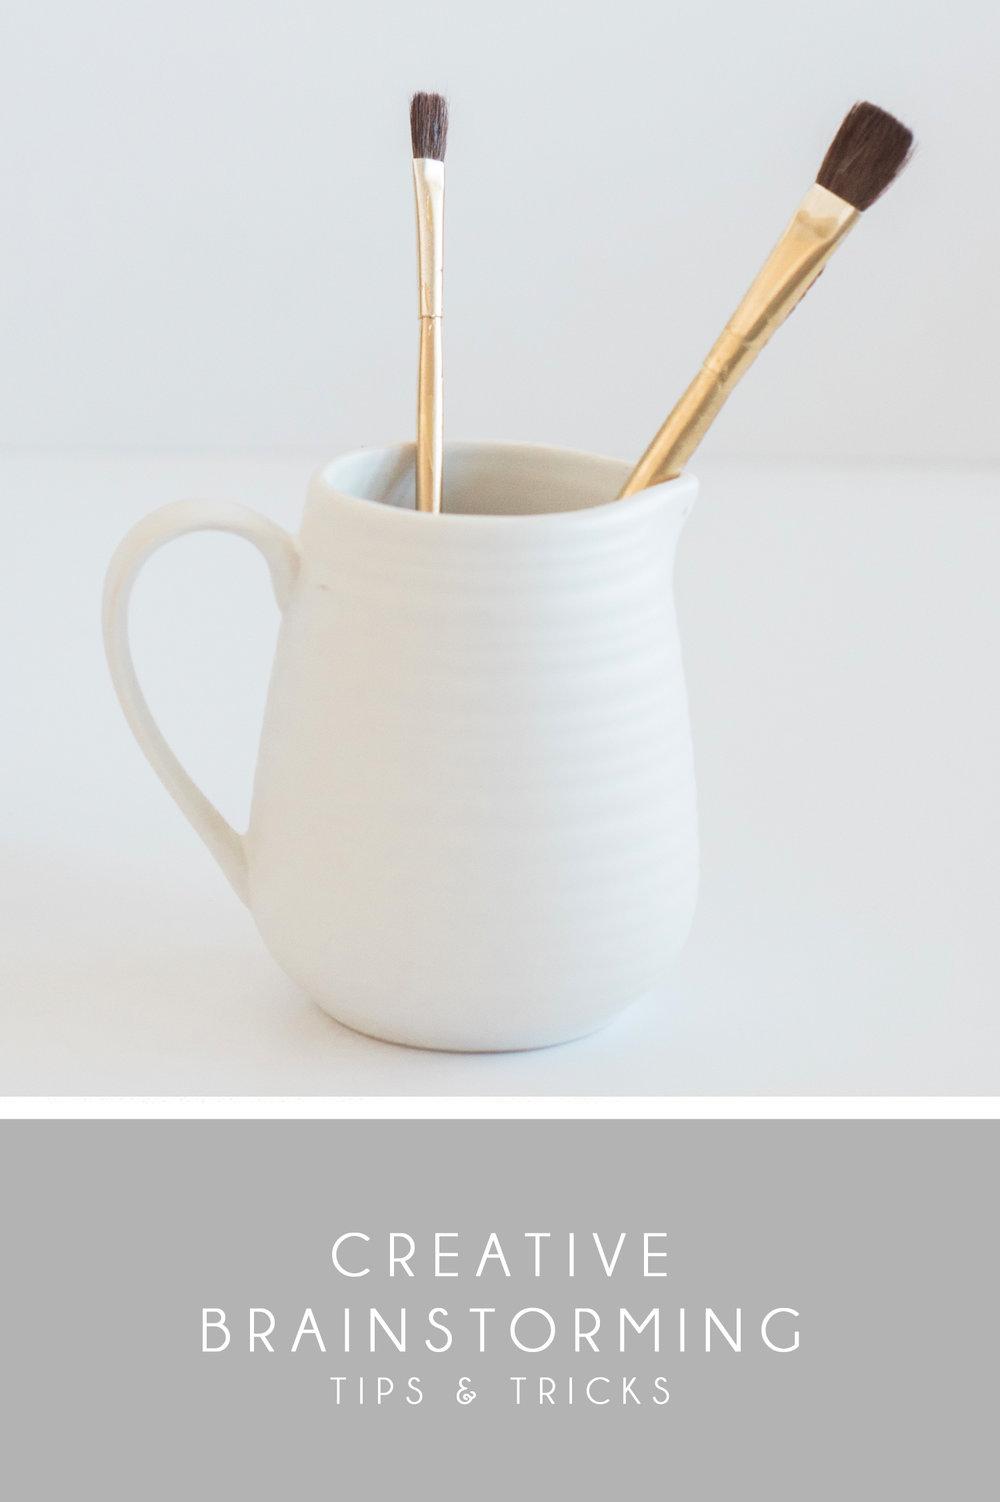 Creative Brainstorming Tips | Aceti Design Co.